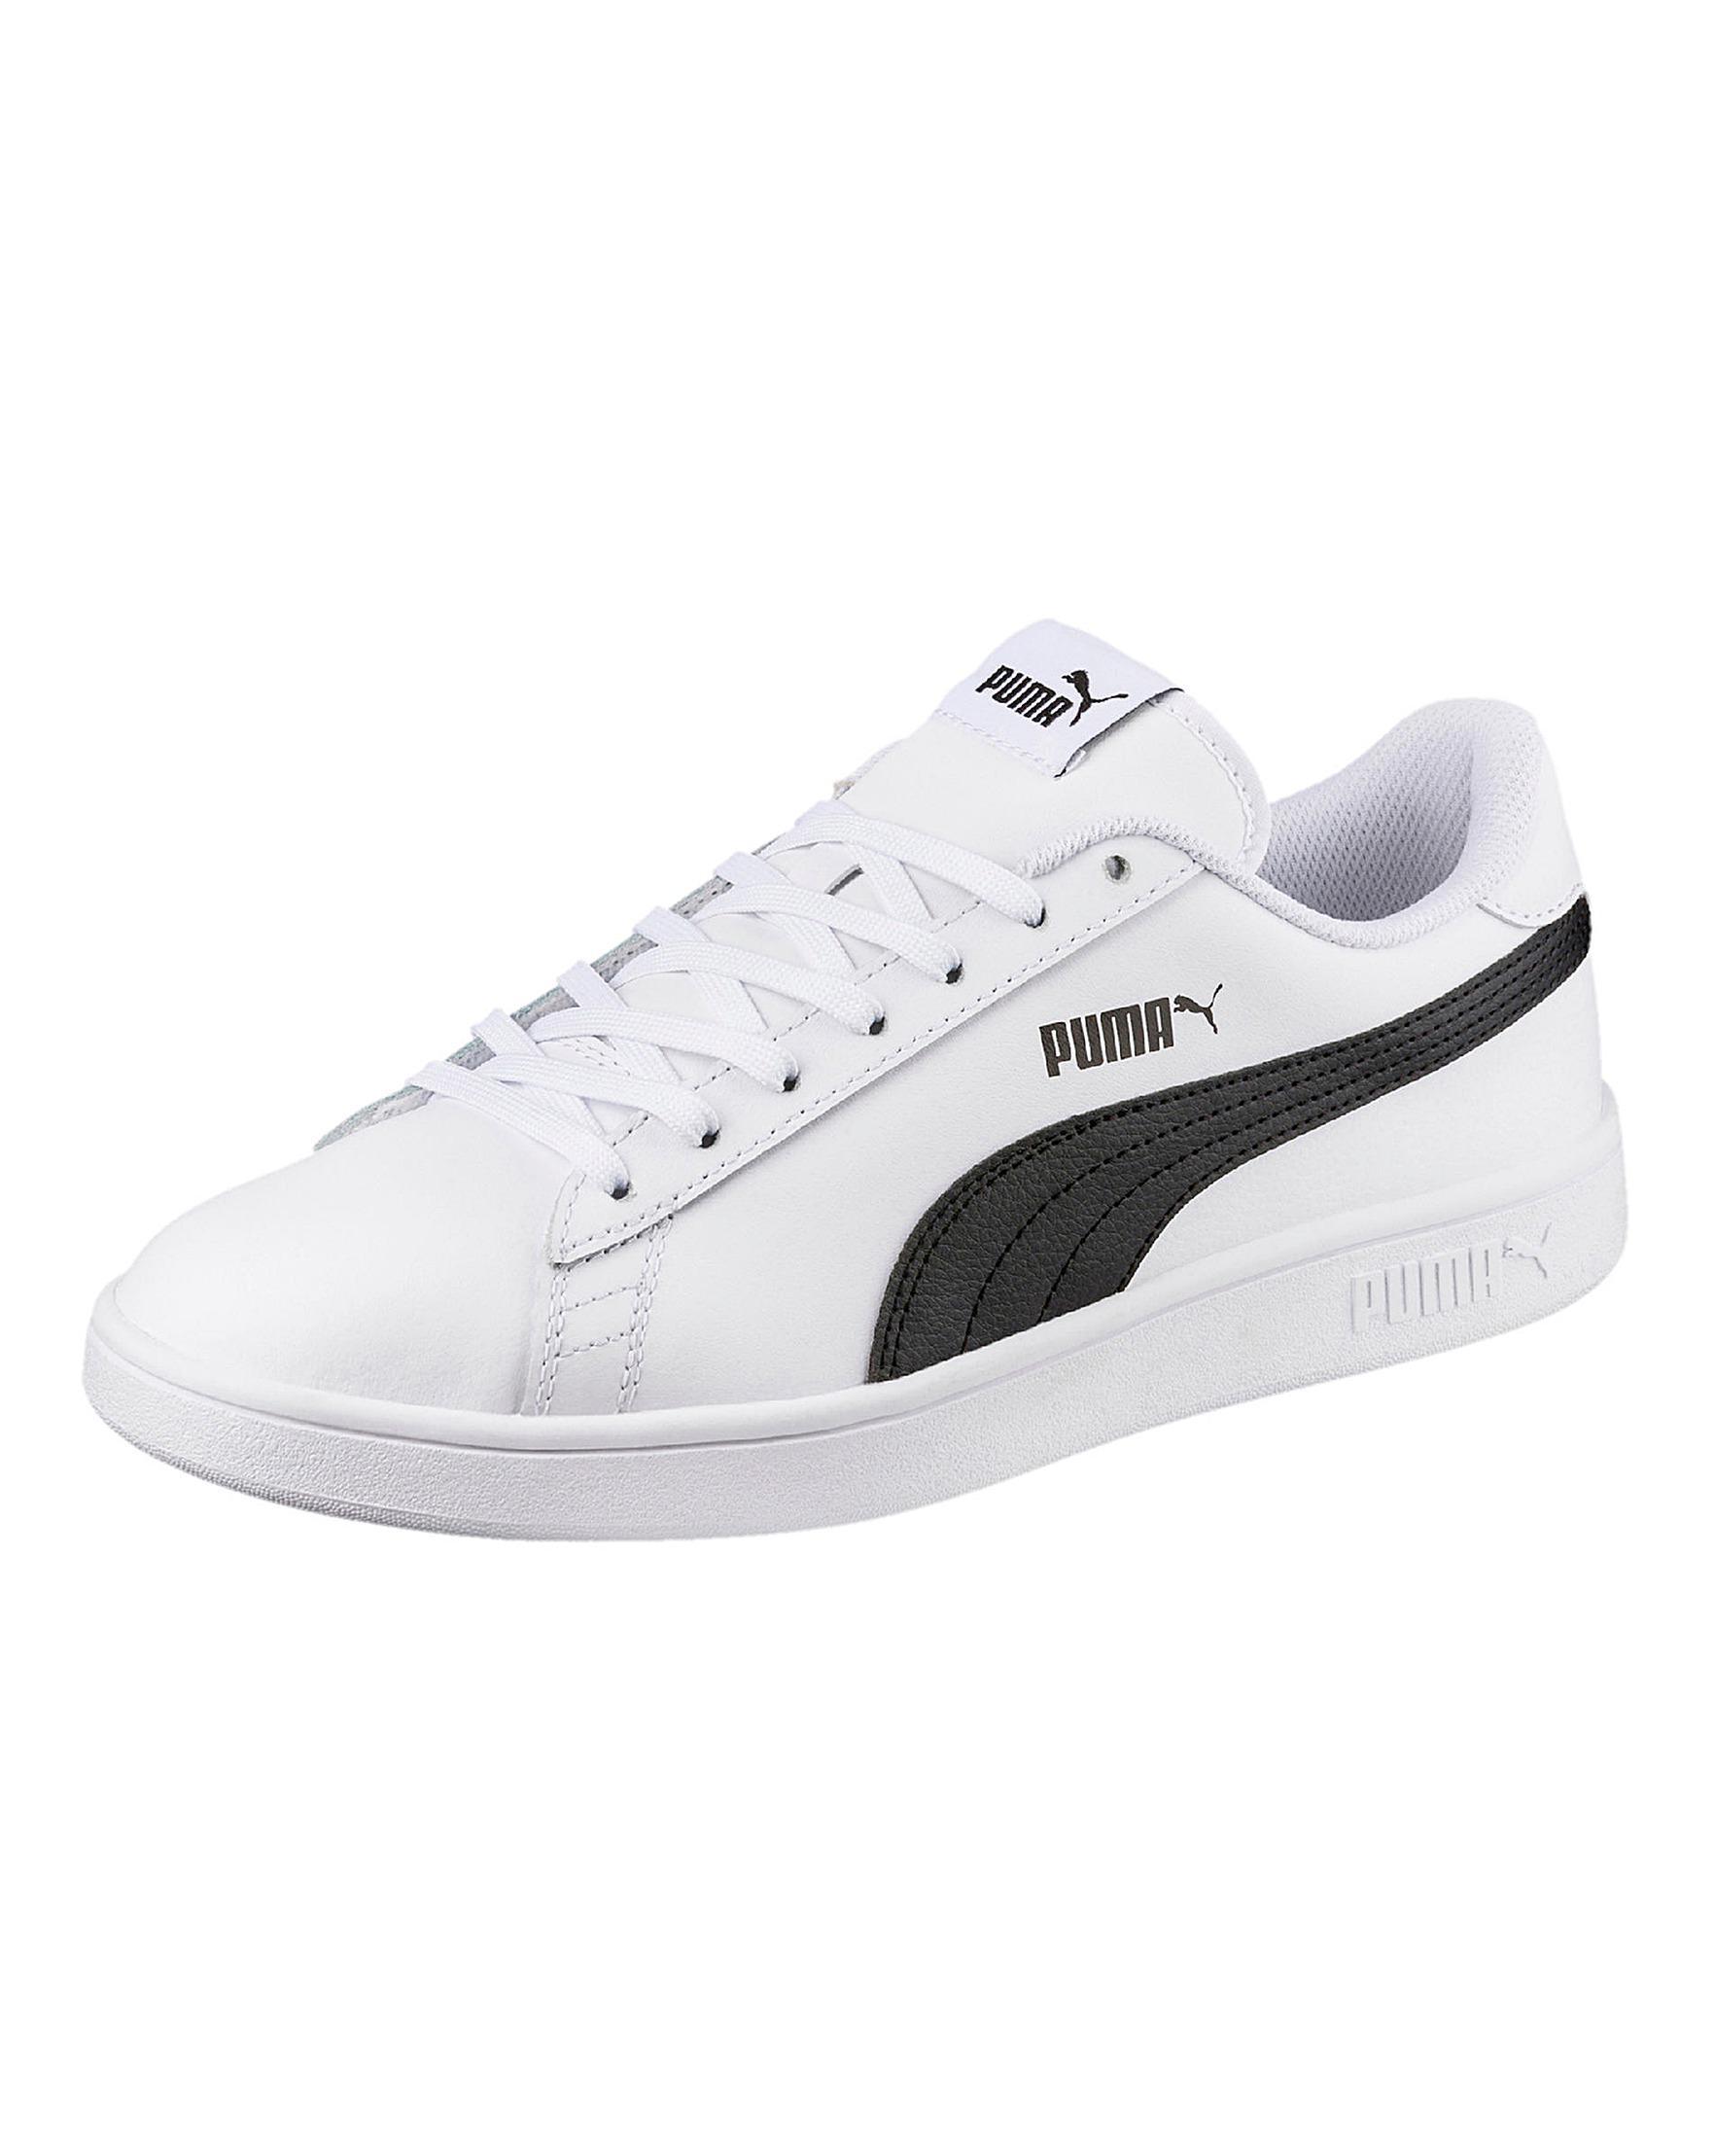 Puma Smash V2 L Trainers in White for Men - Lyst 926d41fe3